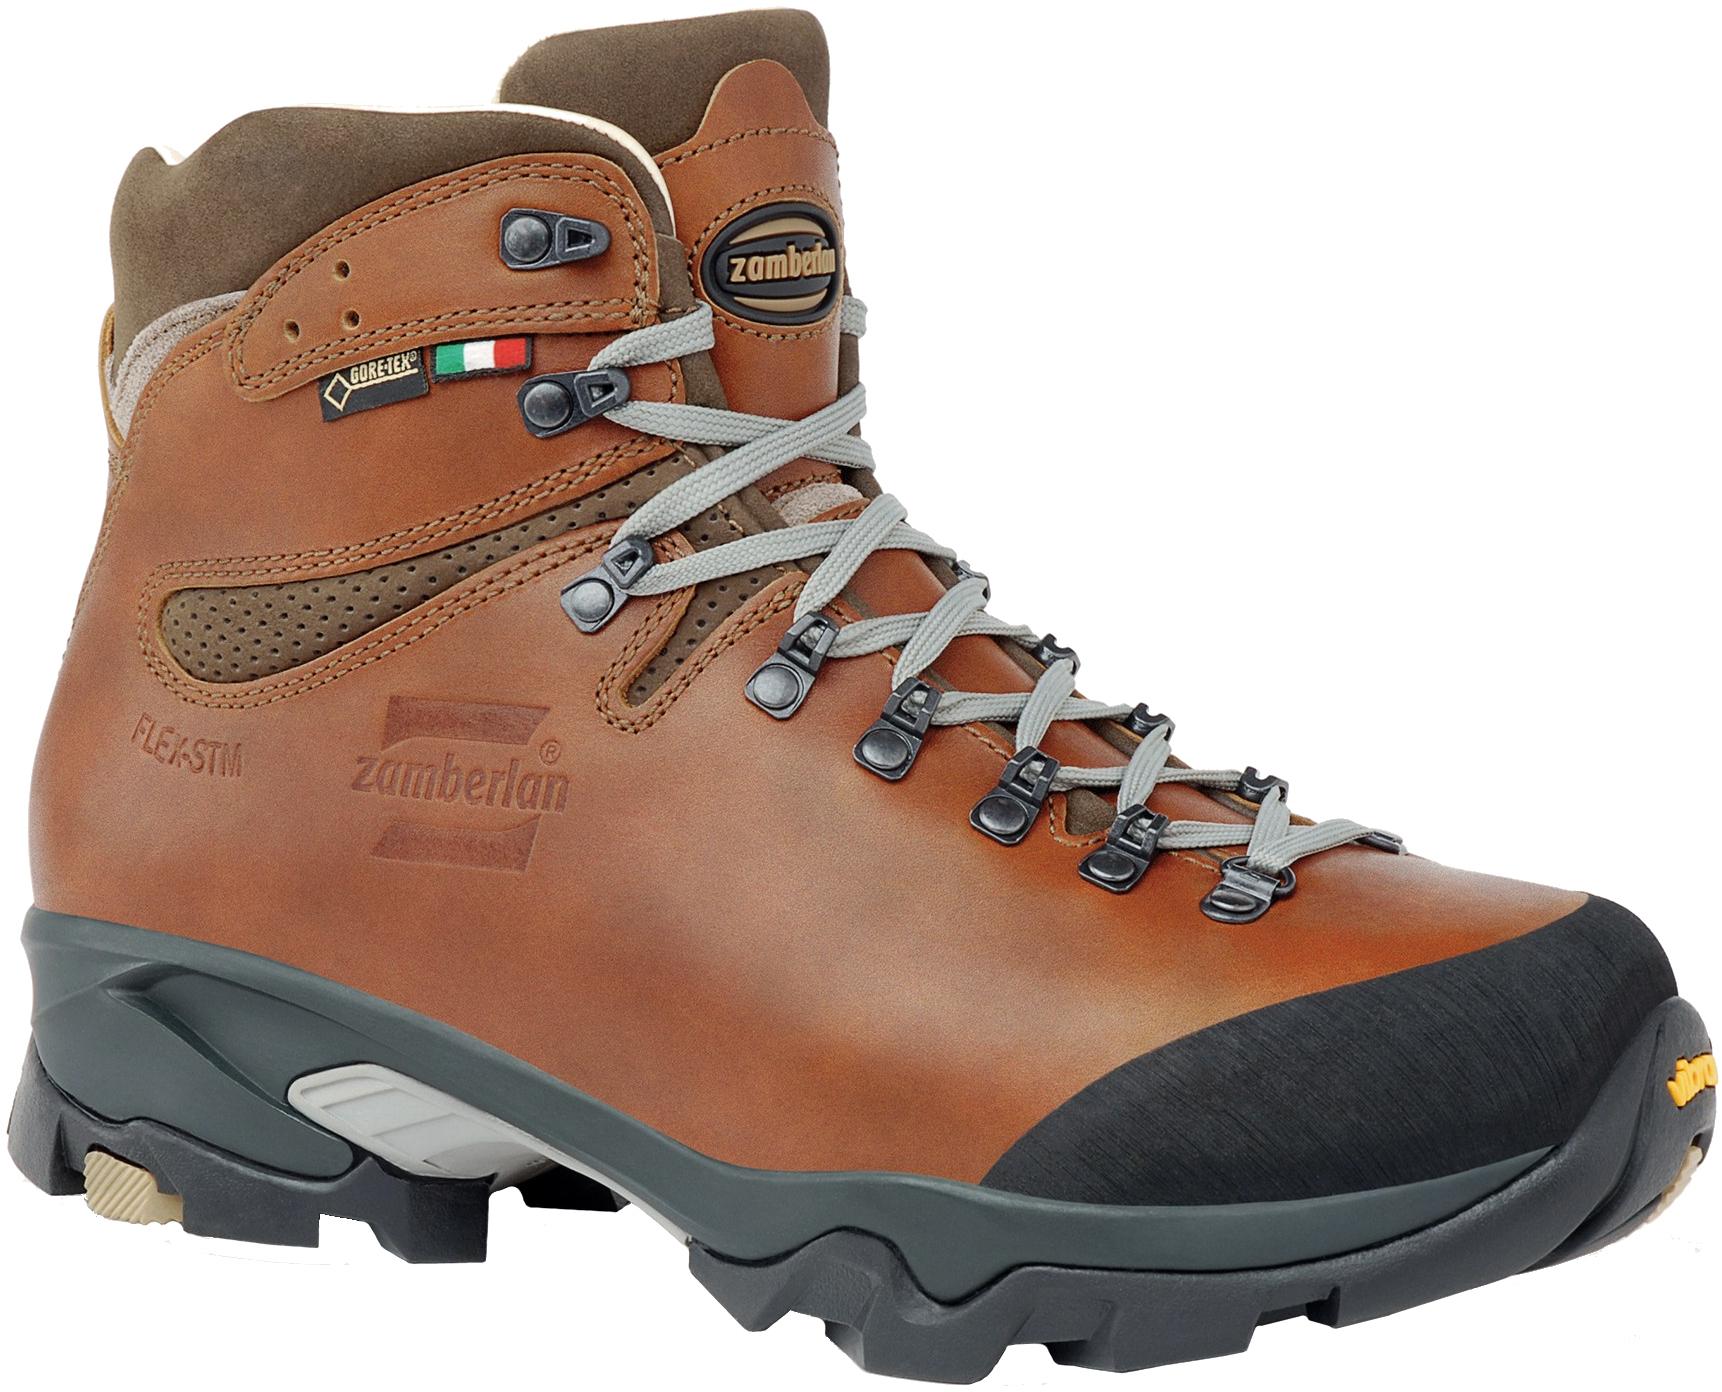 862ebac91c7 Zamberlan 1996 Vioz Lux GTX RR Backpacking Boots - Men's